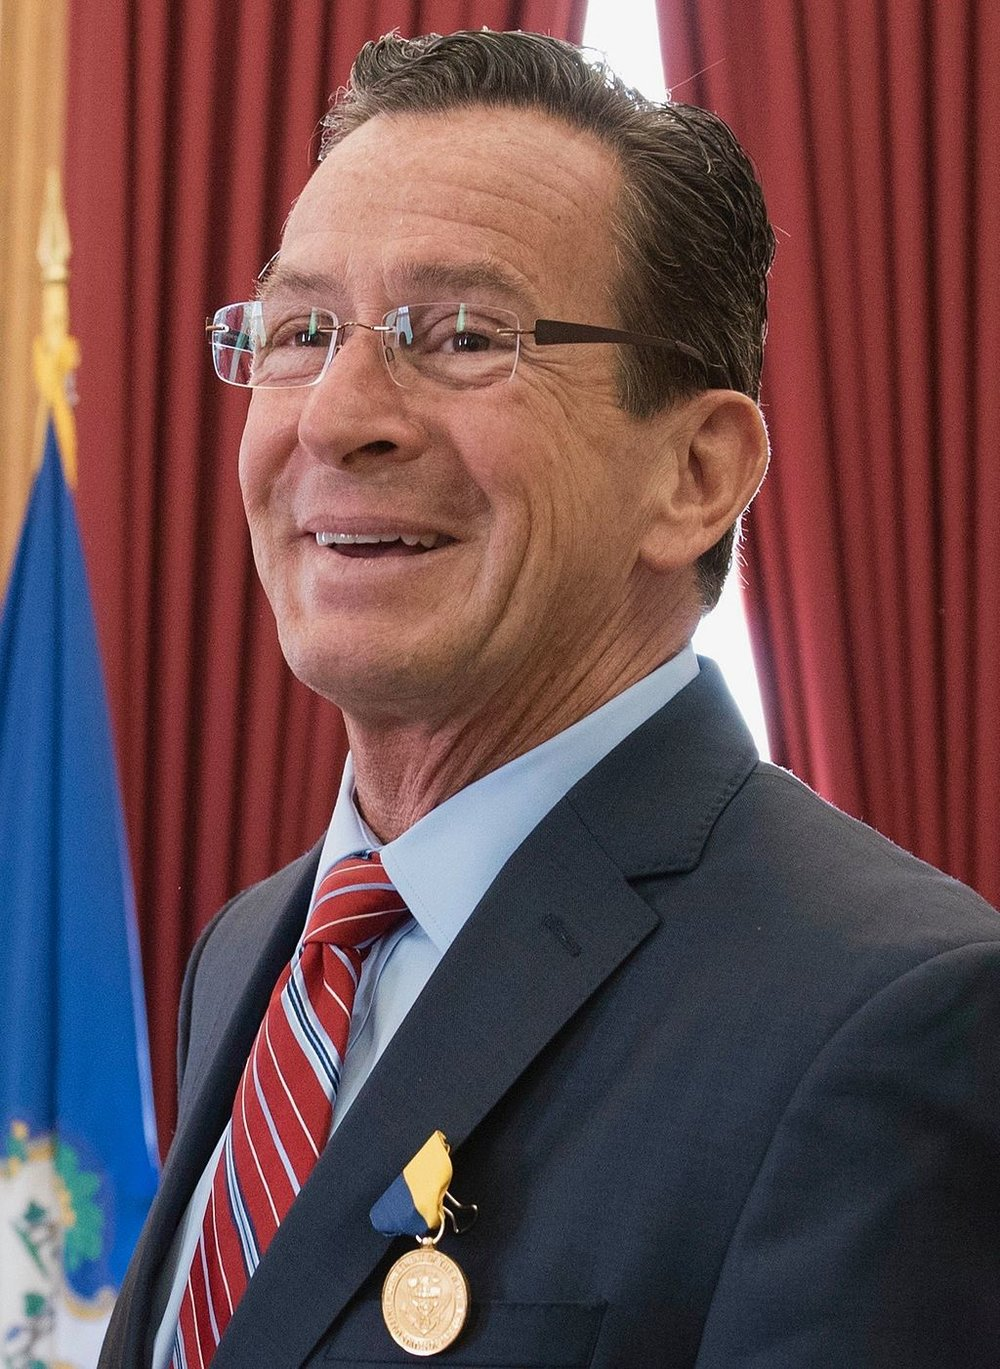 Gov. Dannel Malloy in 2016,